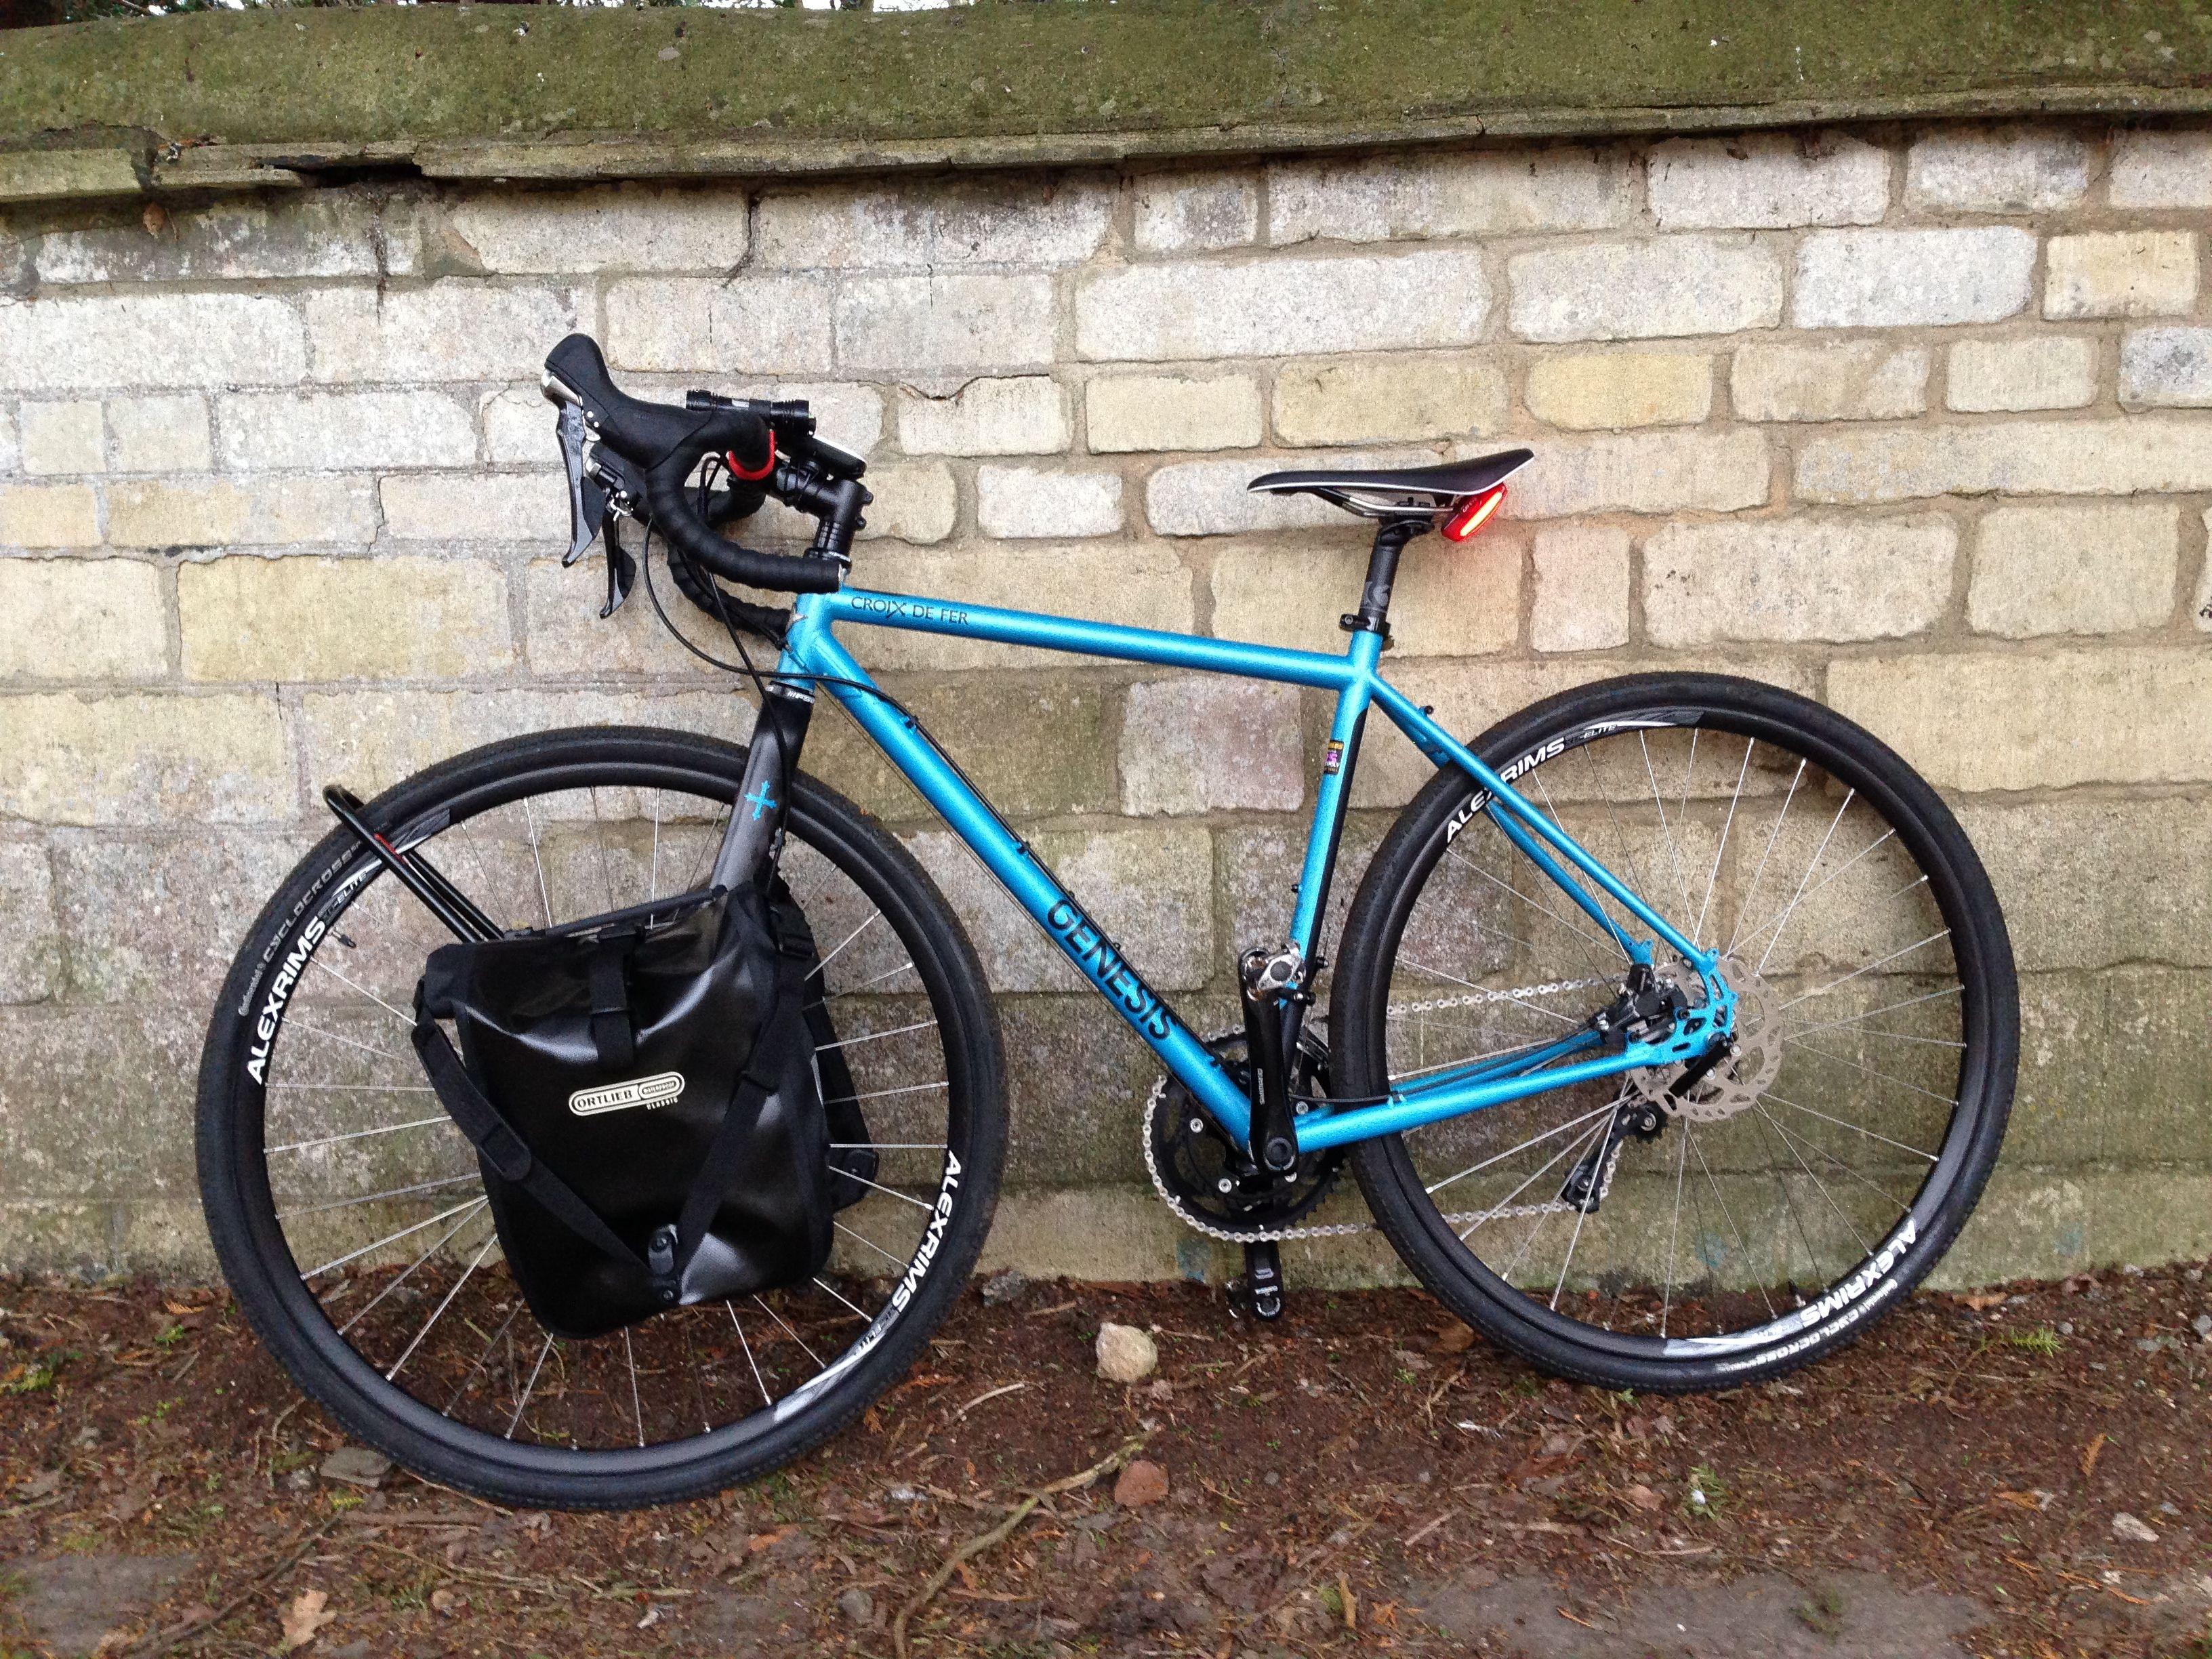 2d77801bf61 Genesis Croix de Fer 30 | Bike ideas | Bicycle, Bike, Old bikes